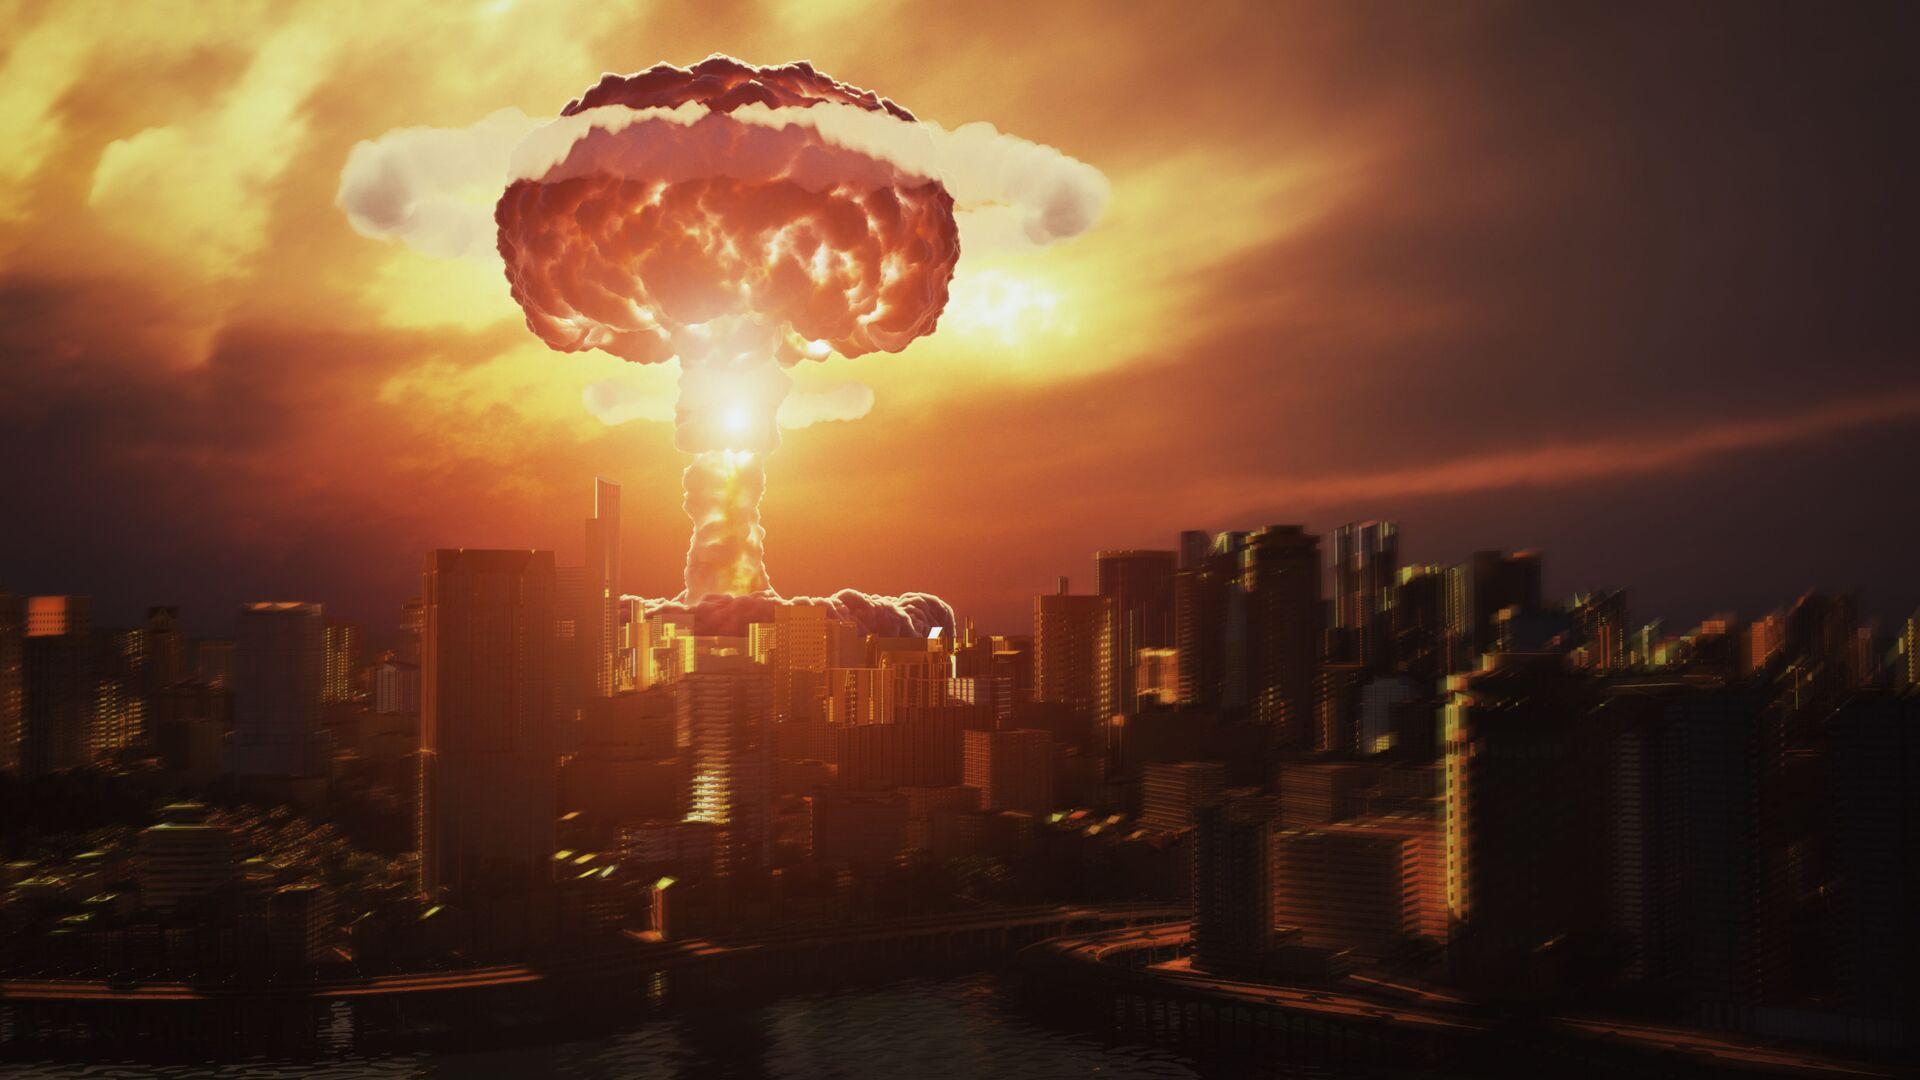 L'esplosione di una bomba nucleare - Sputnik Italia, 1920, 29.09.2021